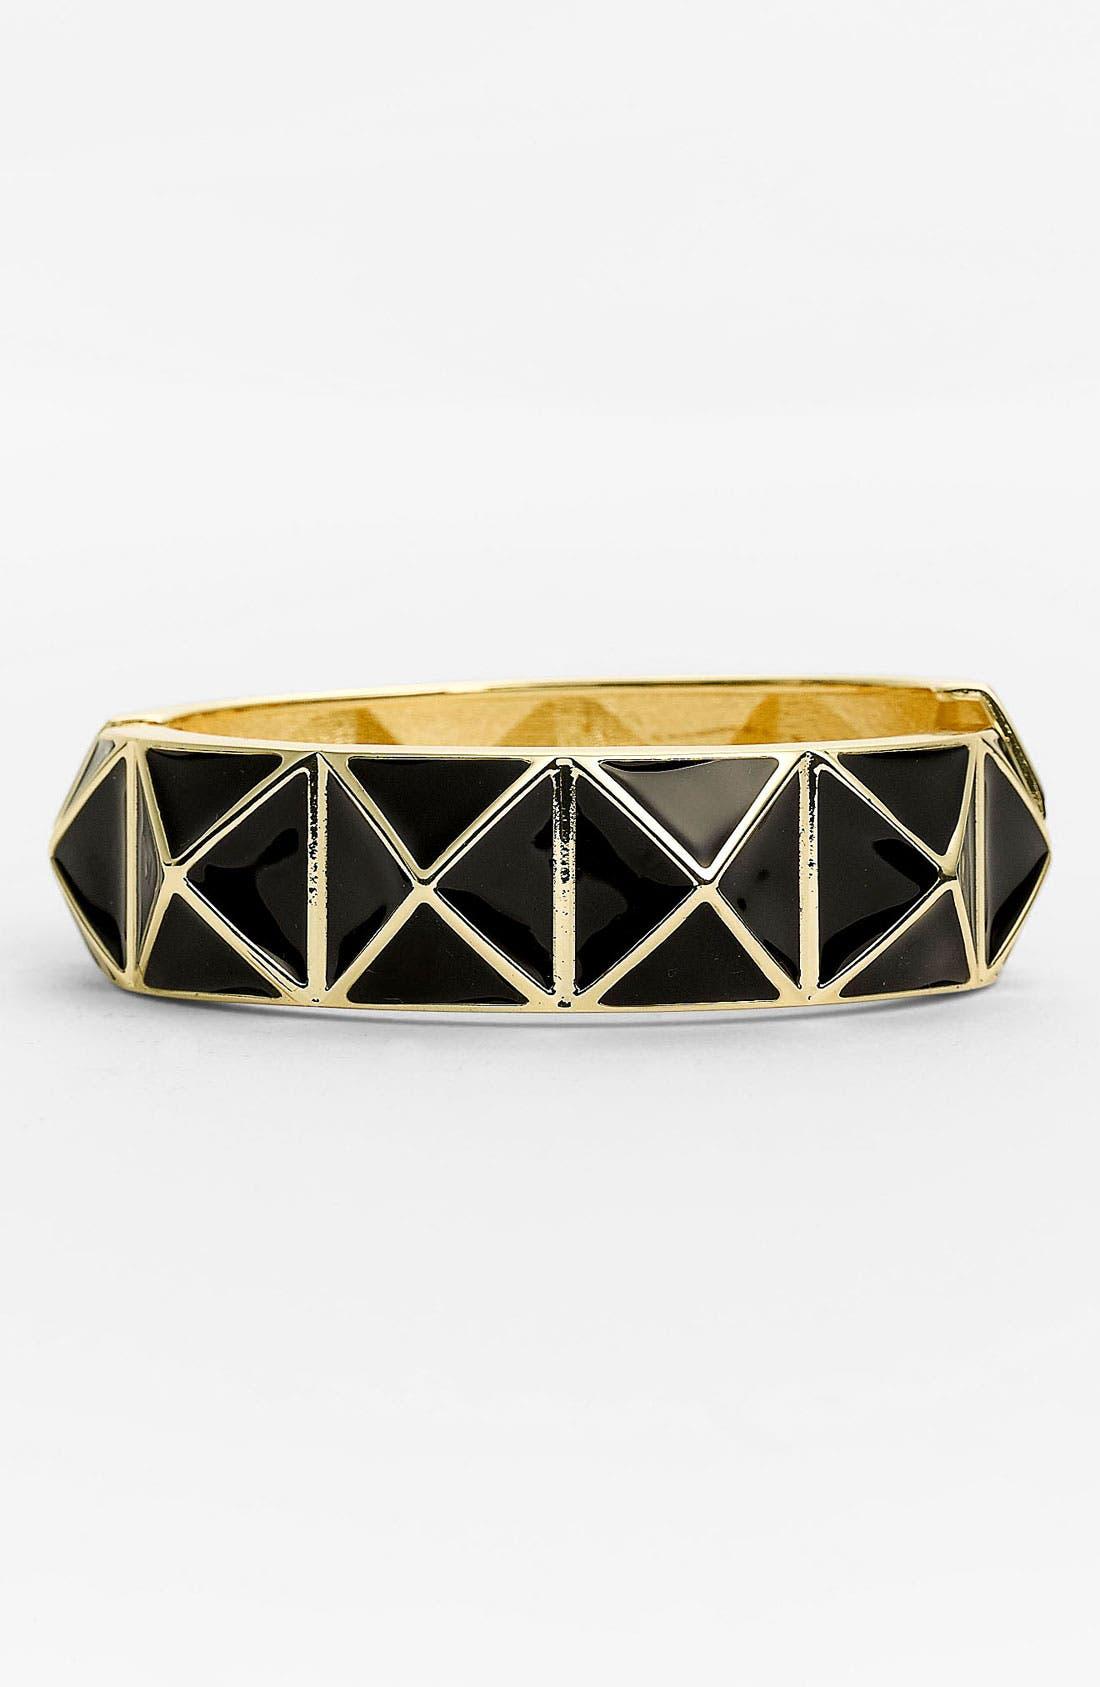 ROBERT ROSE Pyramid Bracelet, Main, color, 001